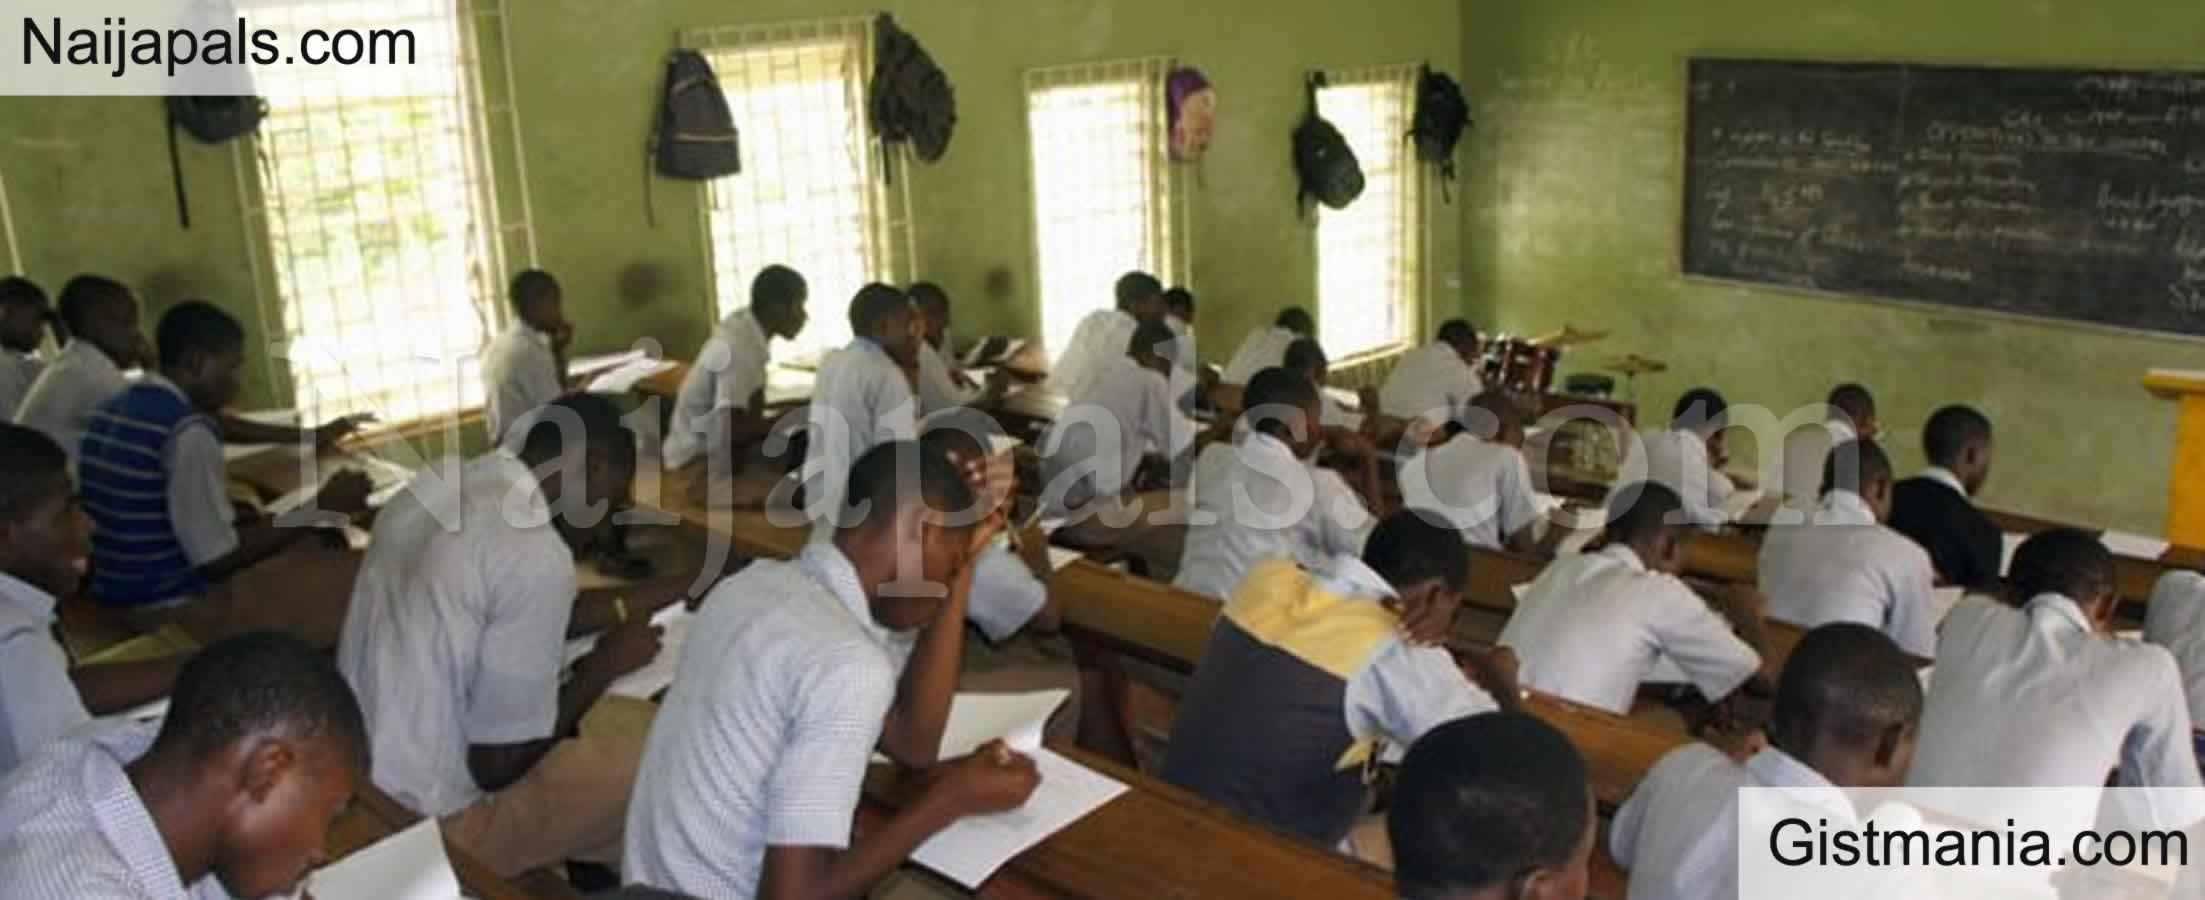 <img alt='.' class='lazyload' data-src='https://img.gistmania.com/emot/shocked.gif' /> <b>Ogun State Student Beats Up Teacher After He Stopped Him From Assaulting Female Classmate</b>